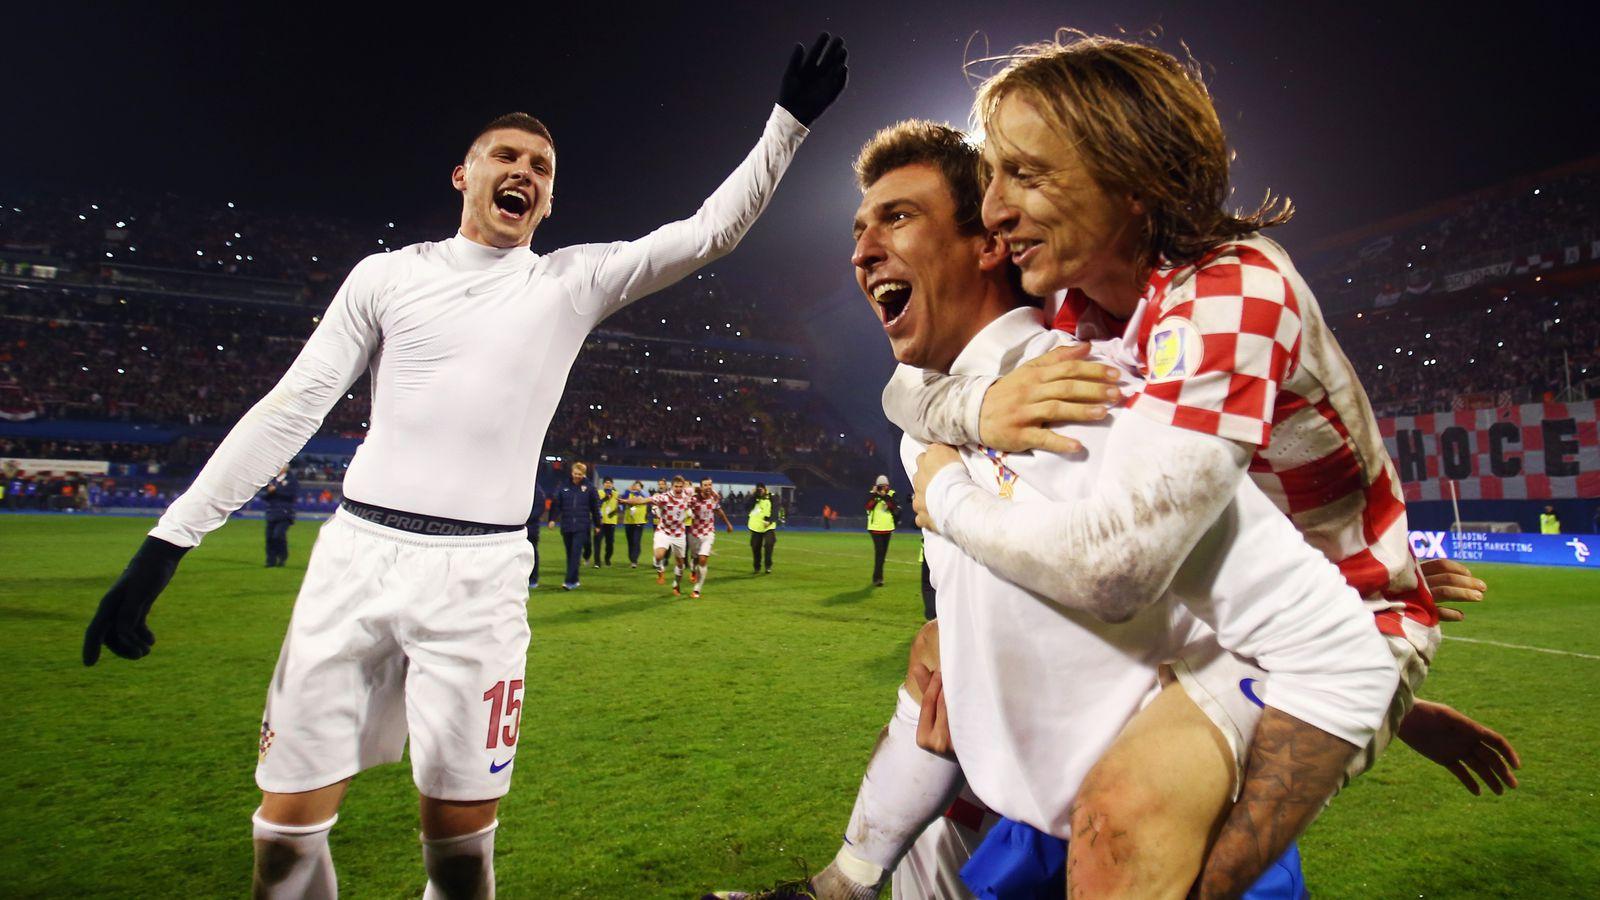 World Cup 2014 Squads Luka Modrić And Mario Mandžukić